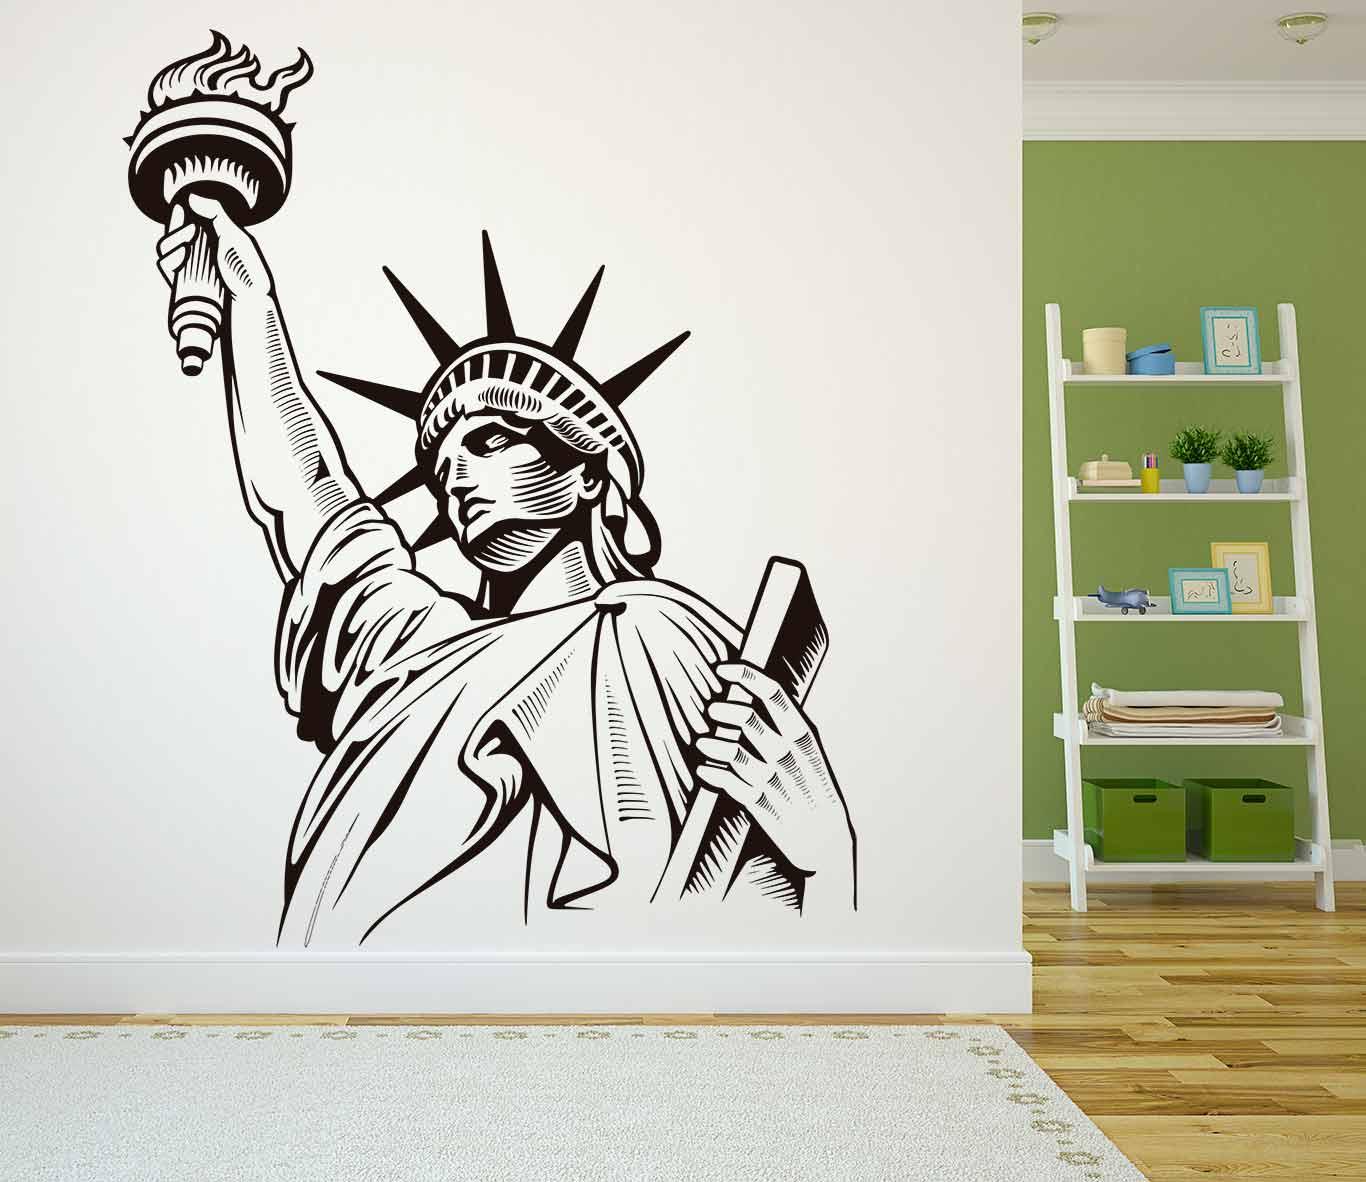 Vinilo decorativo Estatua de la Libertad | Carteles XXL - Impresión carteleria publicitaria